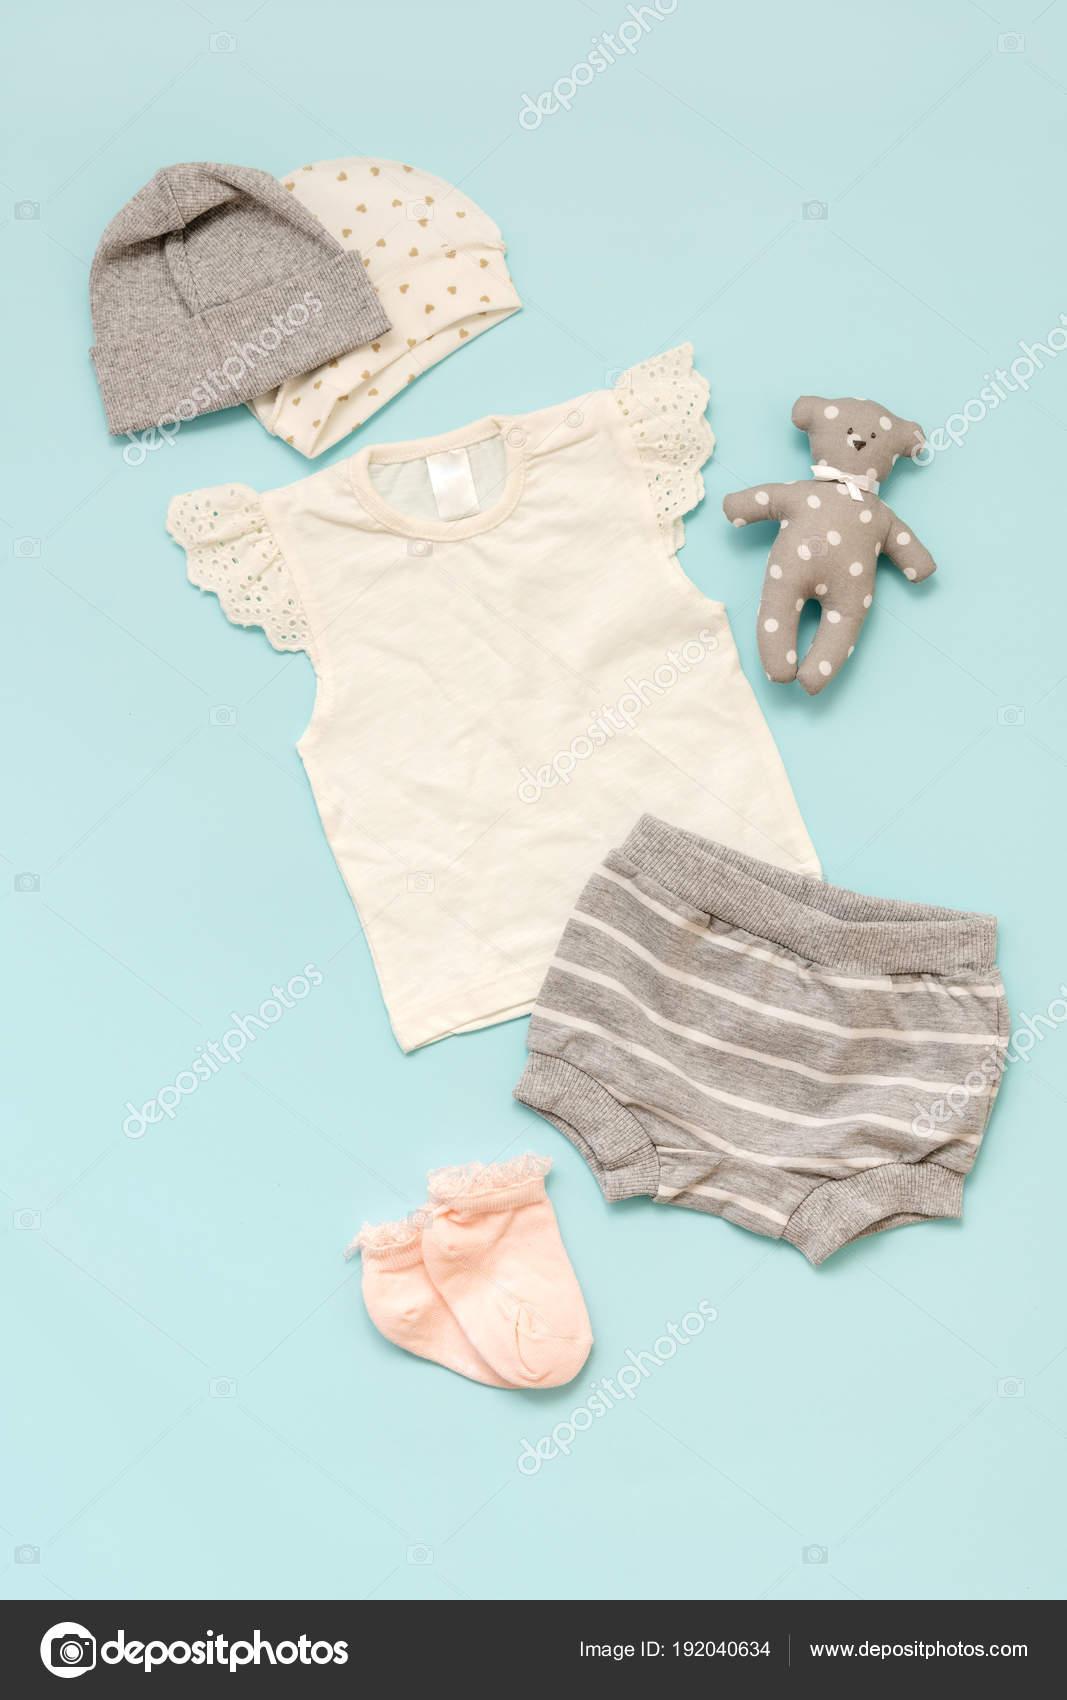 972c5a29b7a Σετ Παιδικά Ρούχα Μπλε Φόντο Για Κορίτσι Ένα Shirt Σορτς — Φωτογραφία  Αρχείου